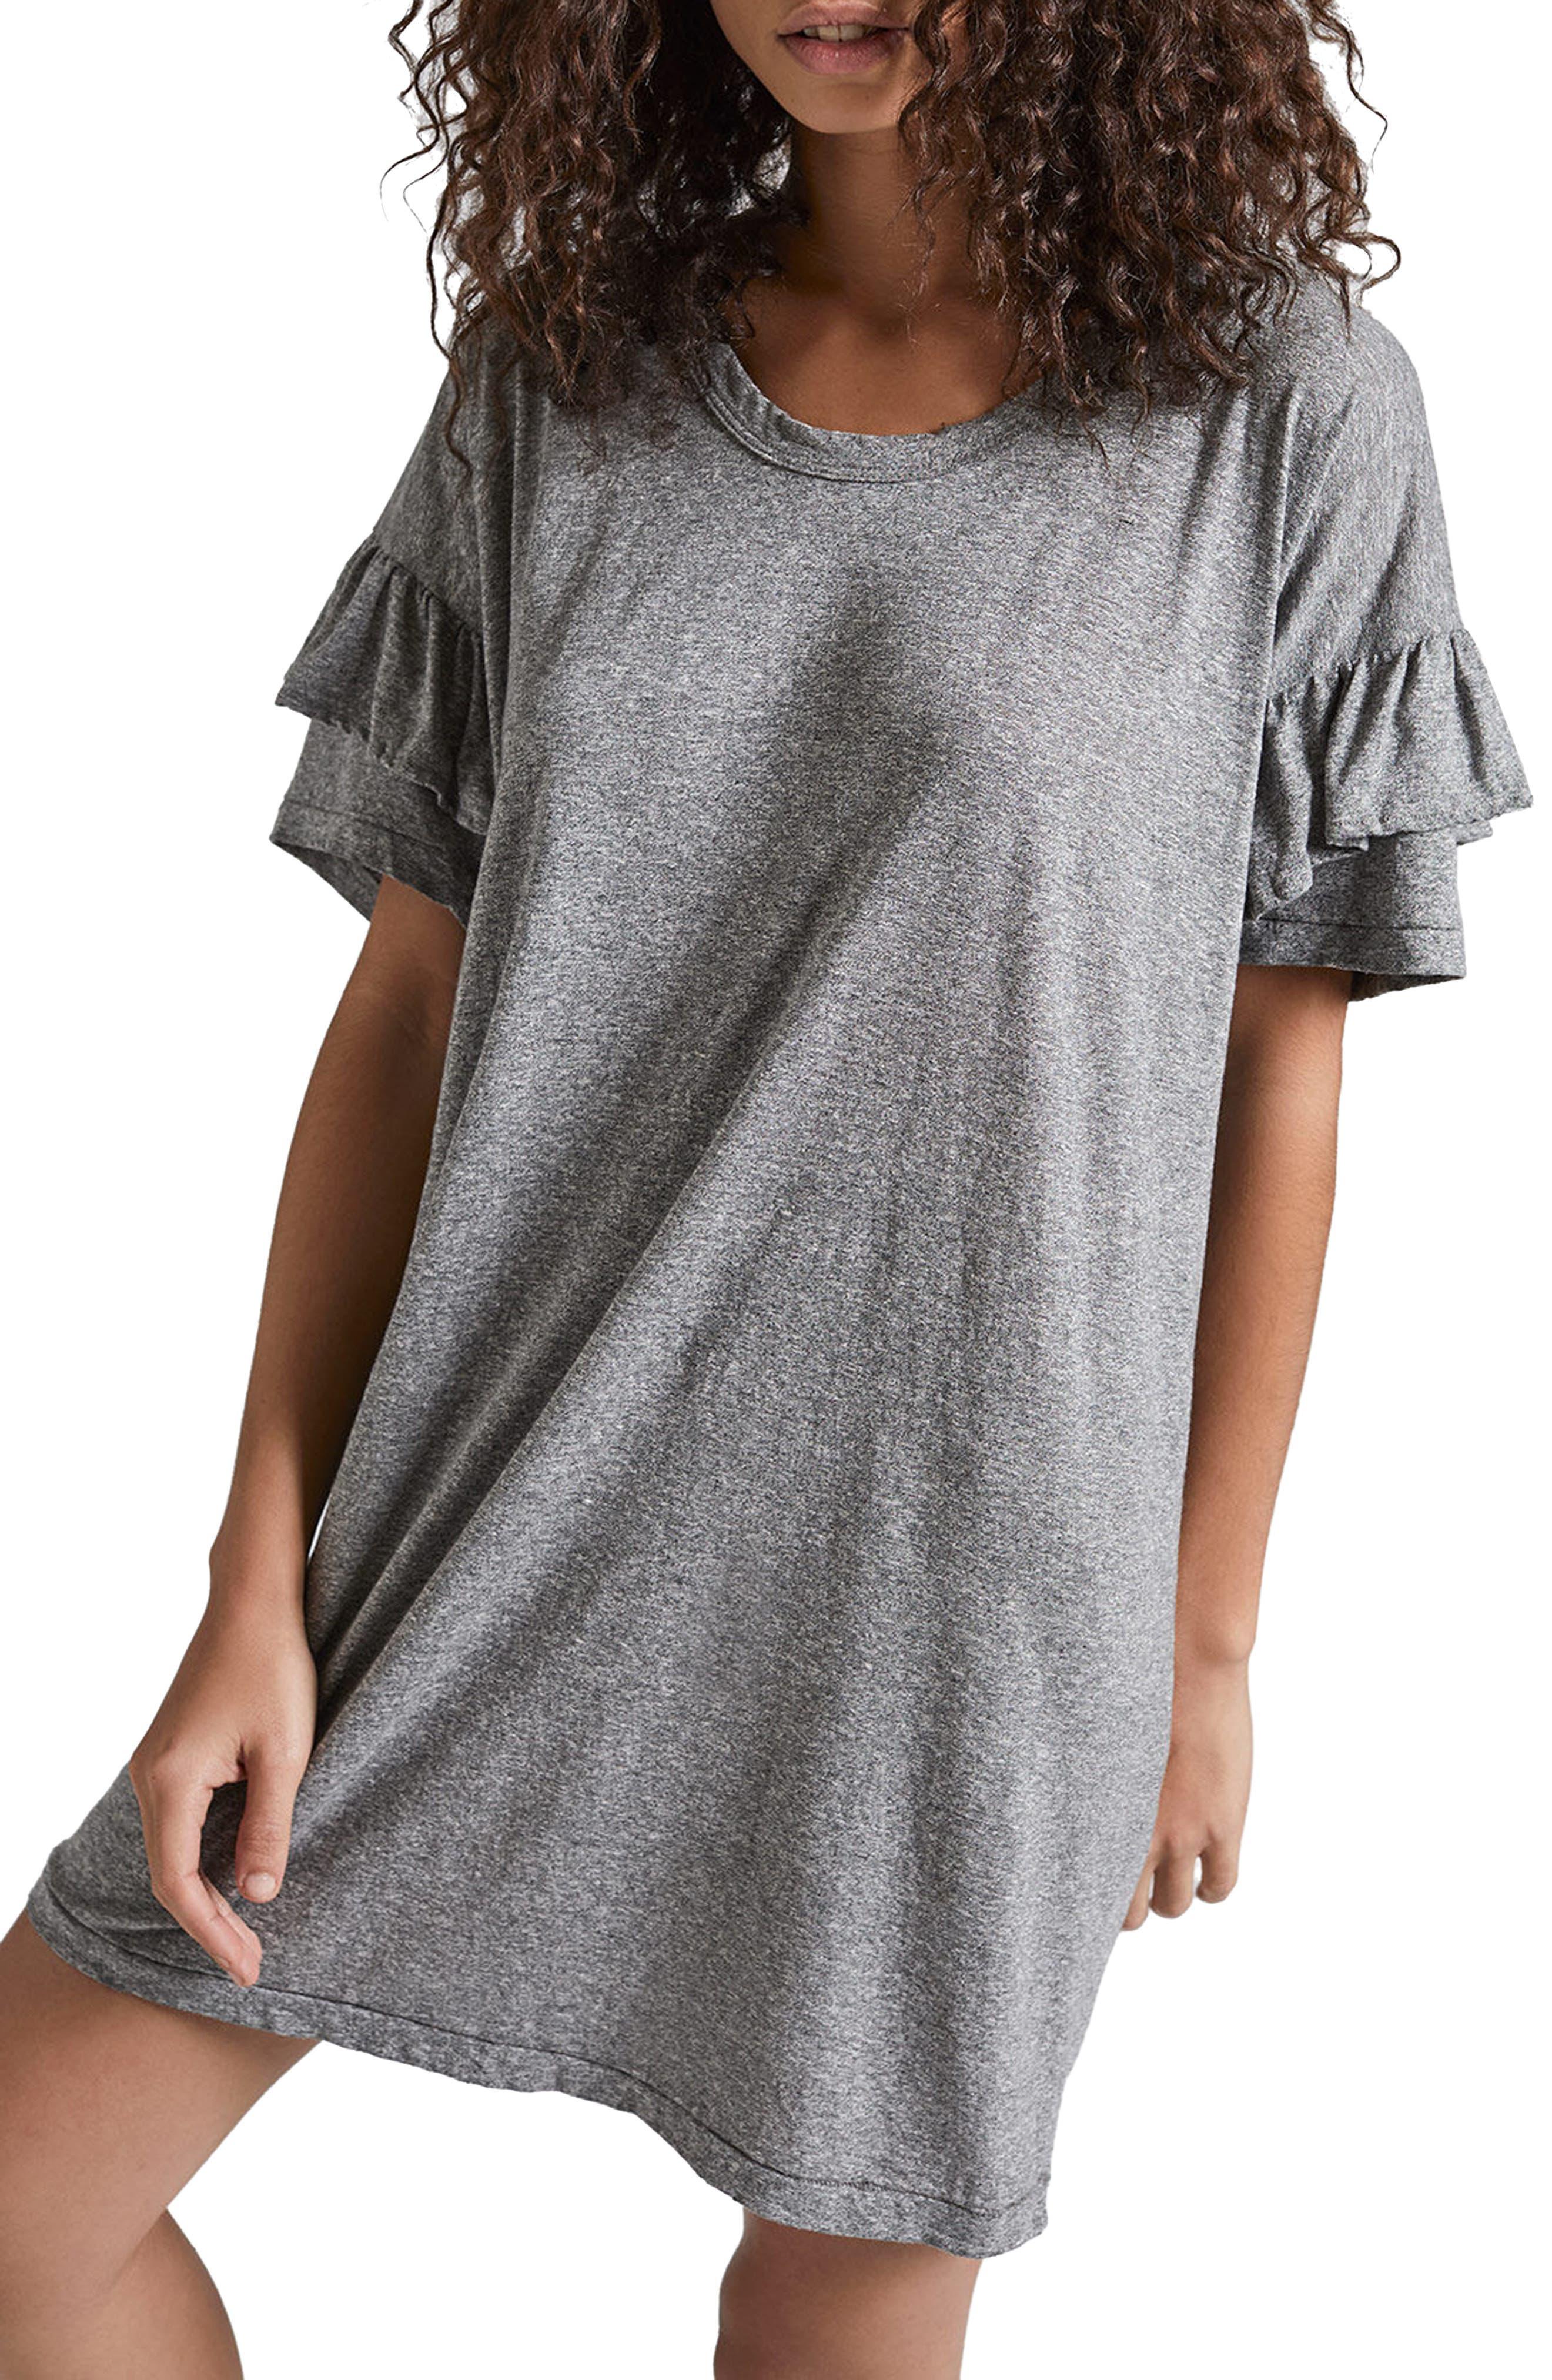 Alternate Image 1 Selected - Current/Elliott Ruffle Roadie T-Shirt Dress